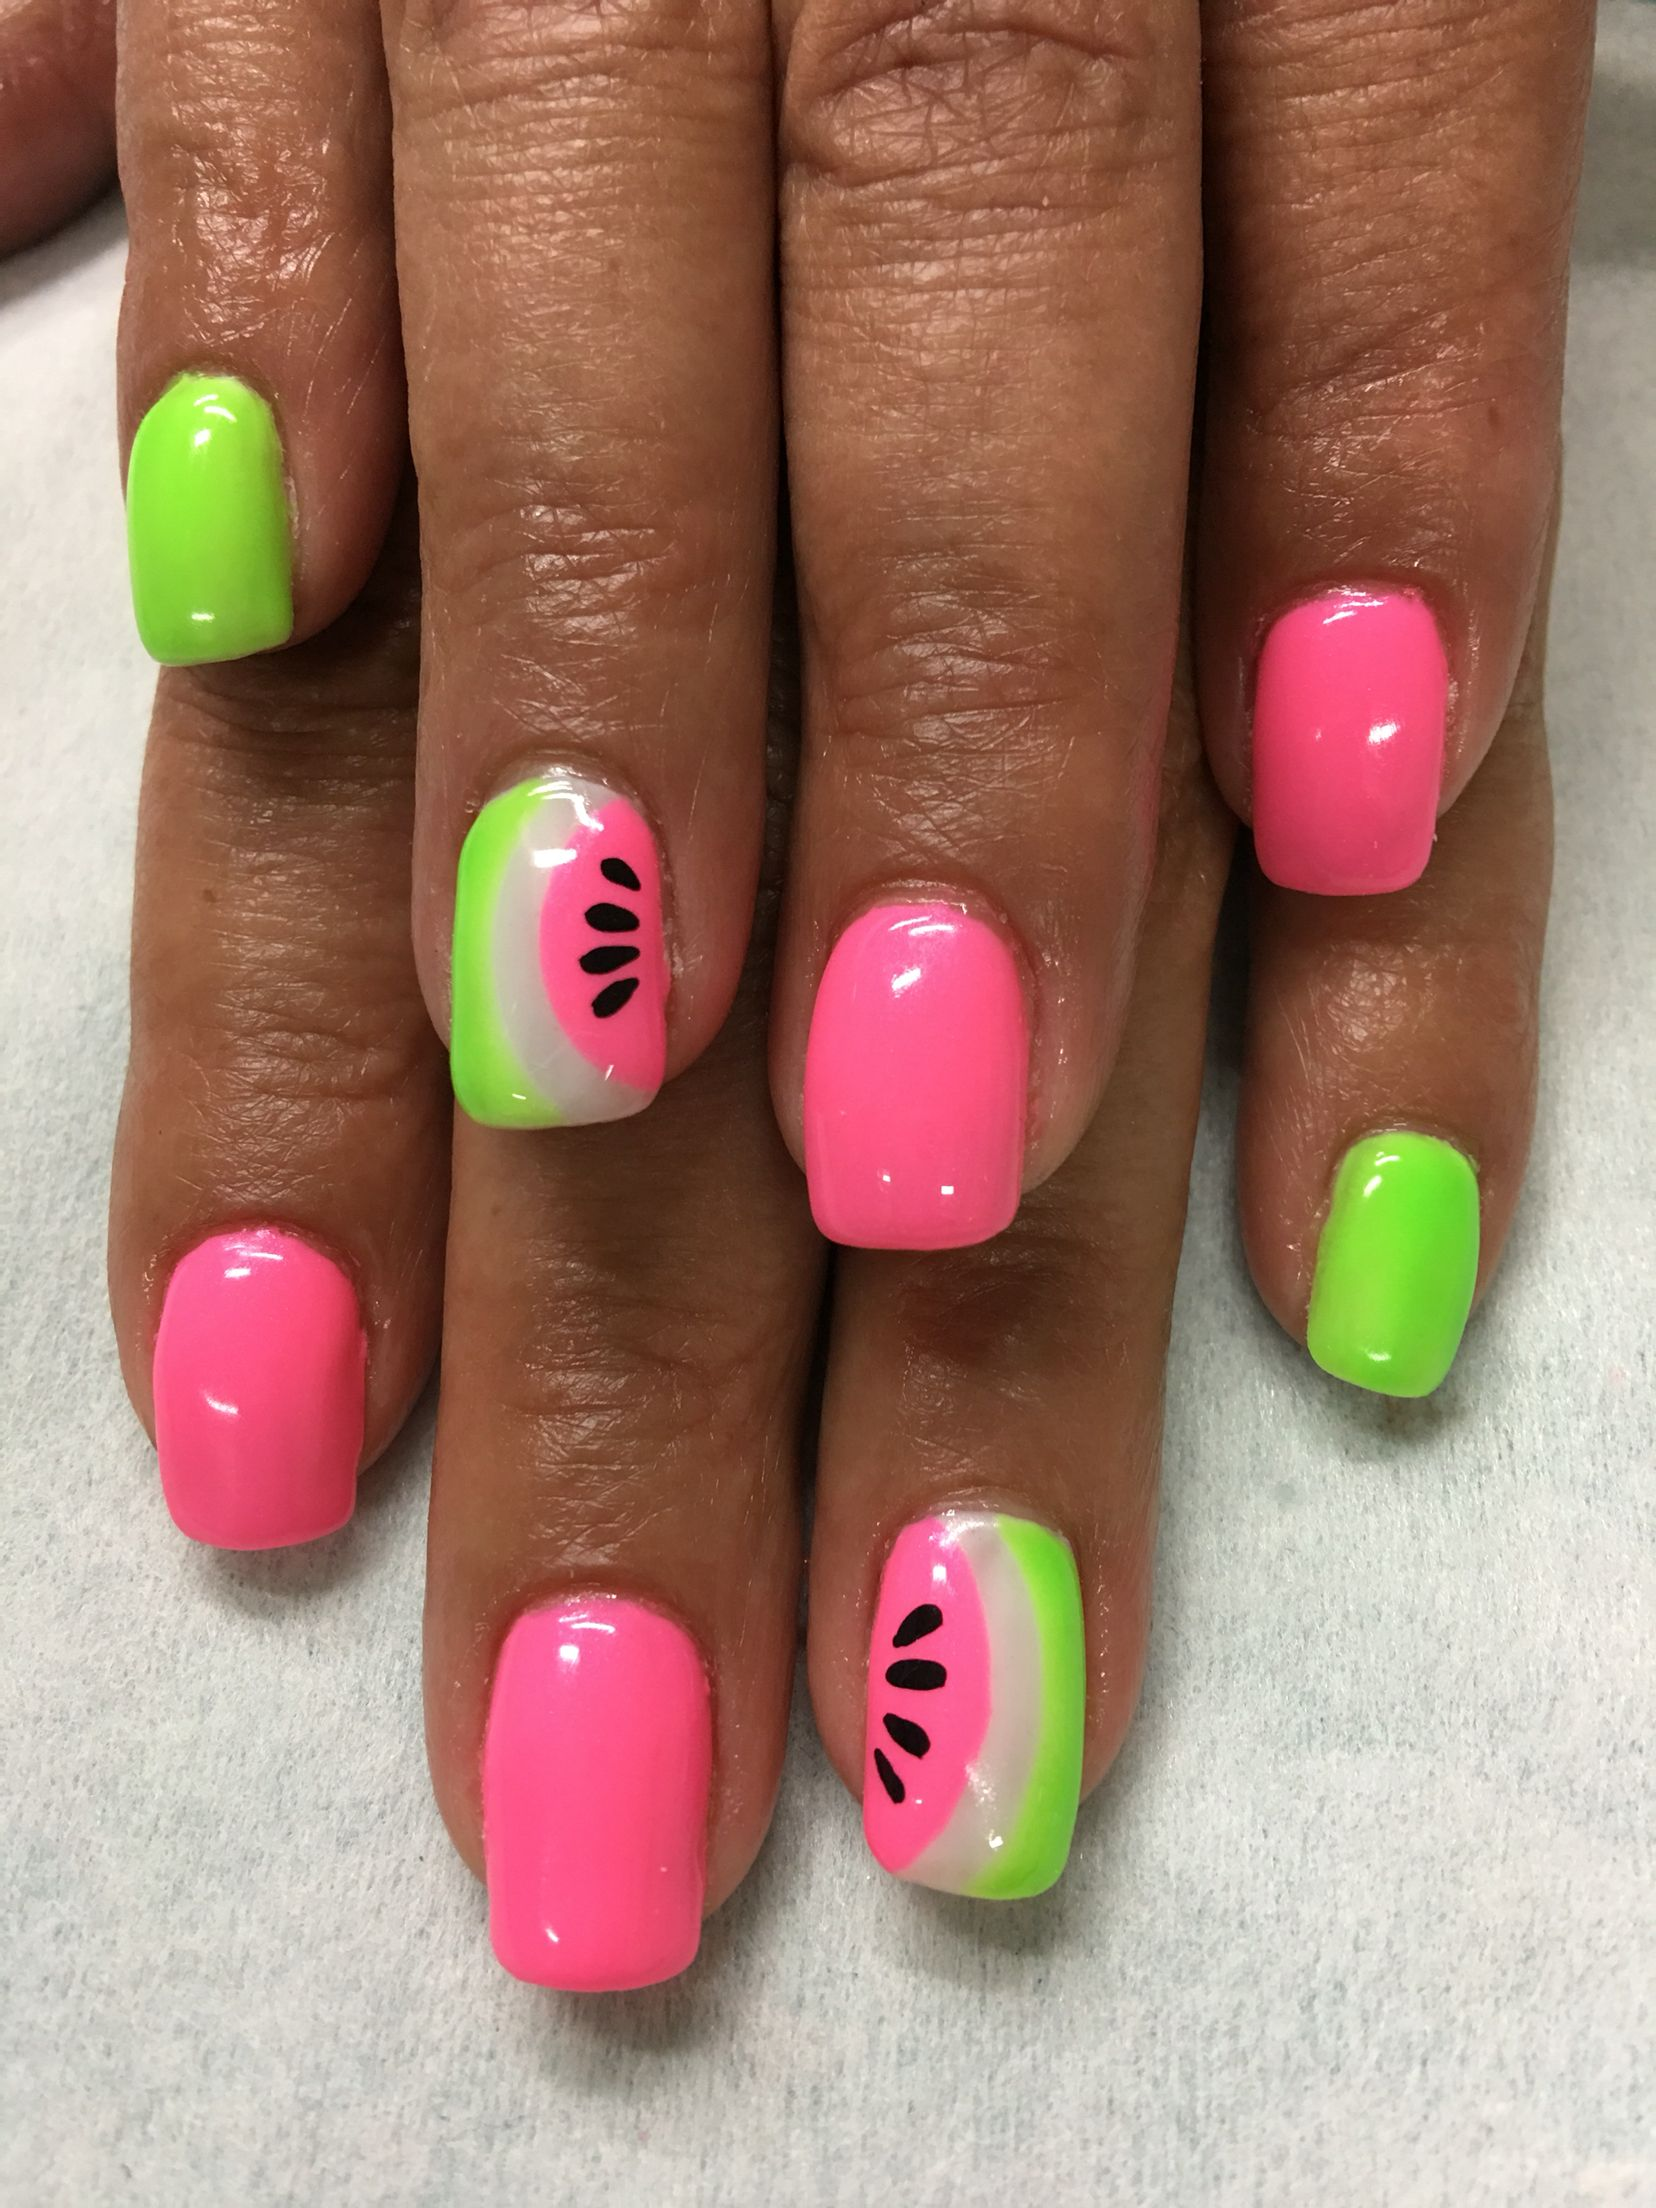 Impress press on manicure nails my style pinterest - Pedicure Manicure